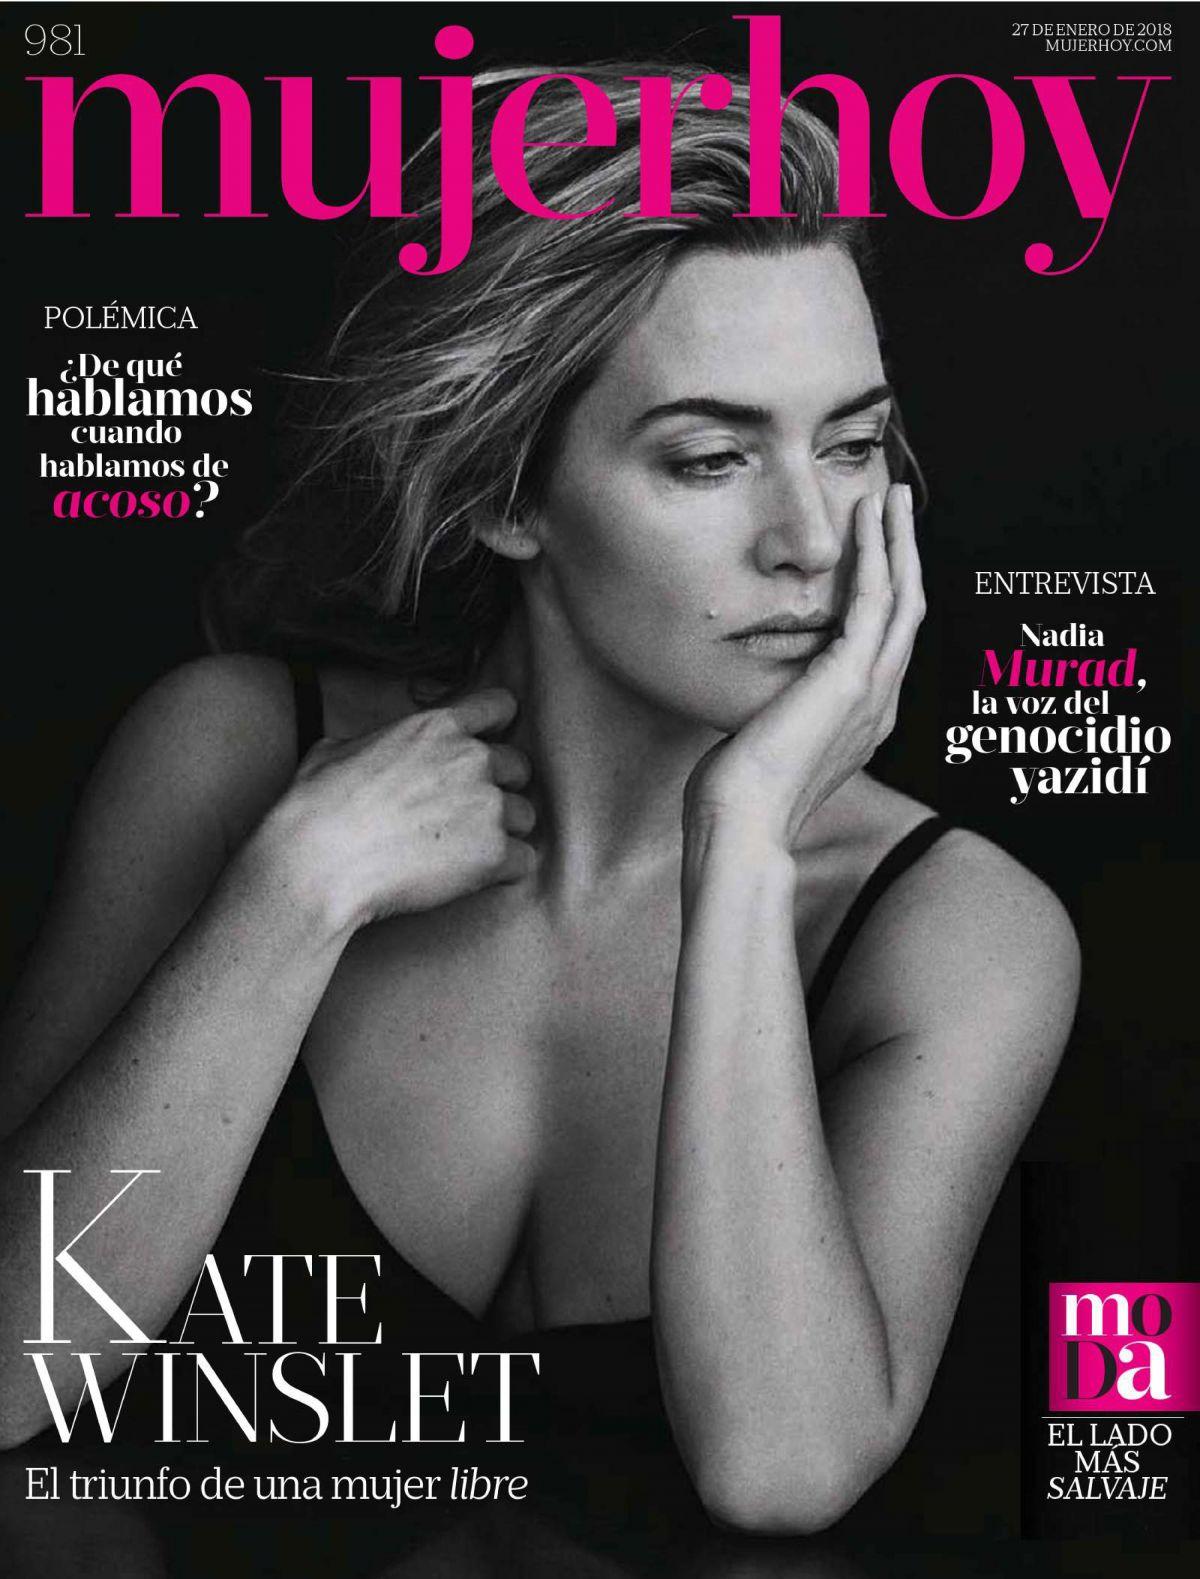 KATE WINSLET in Mujer Hoy Magazine, January 2018 - HawtCelebs